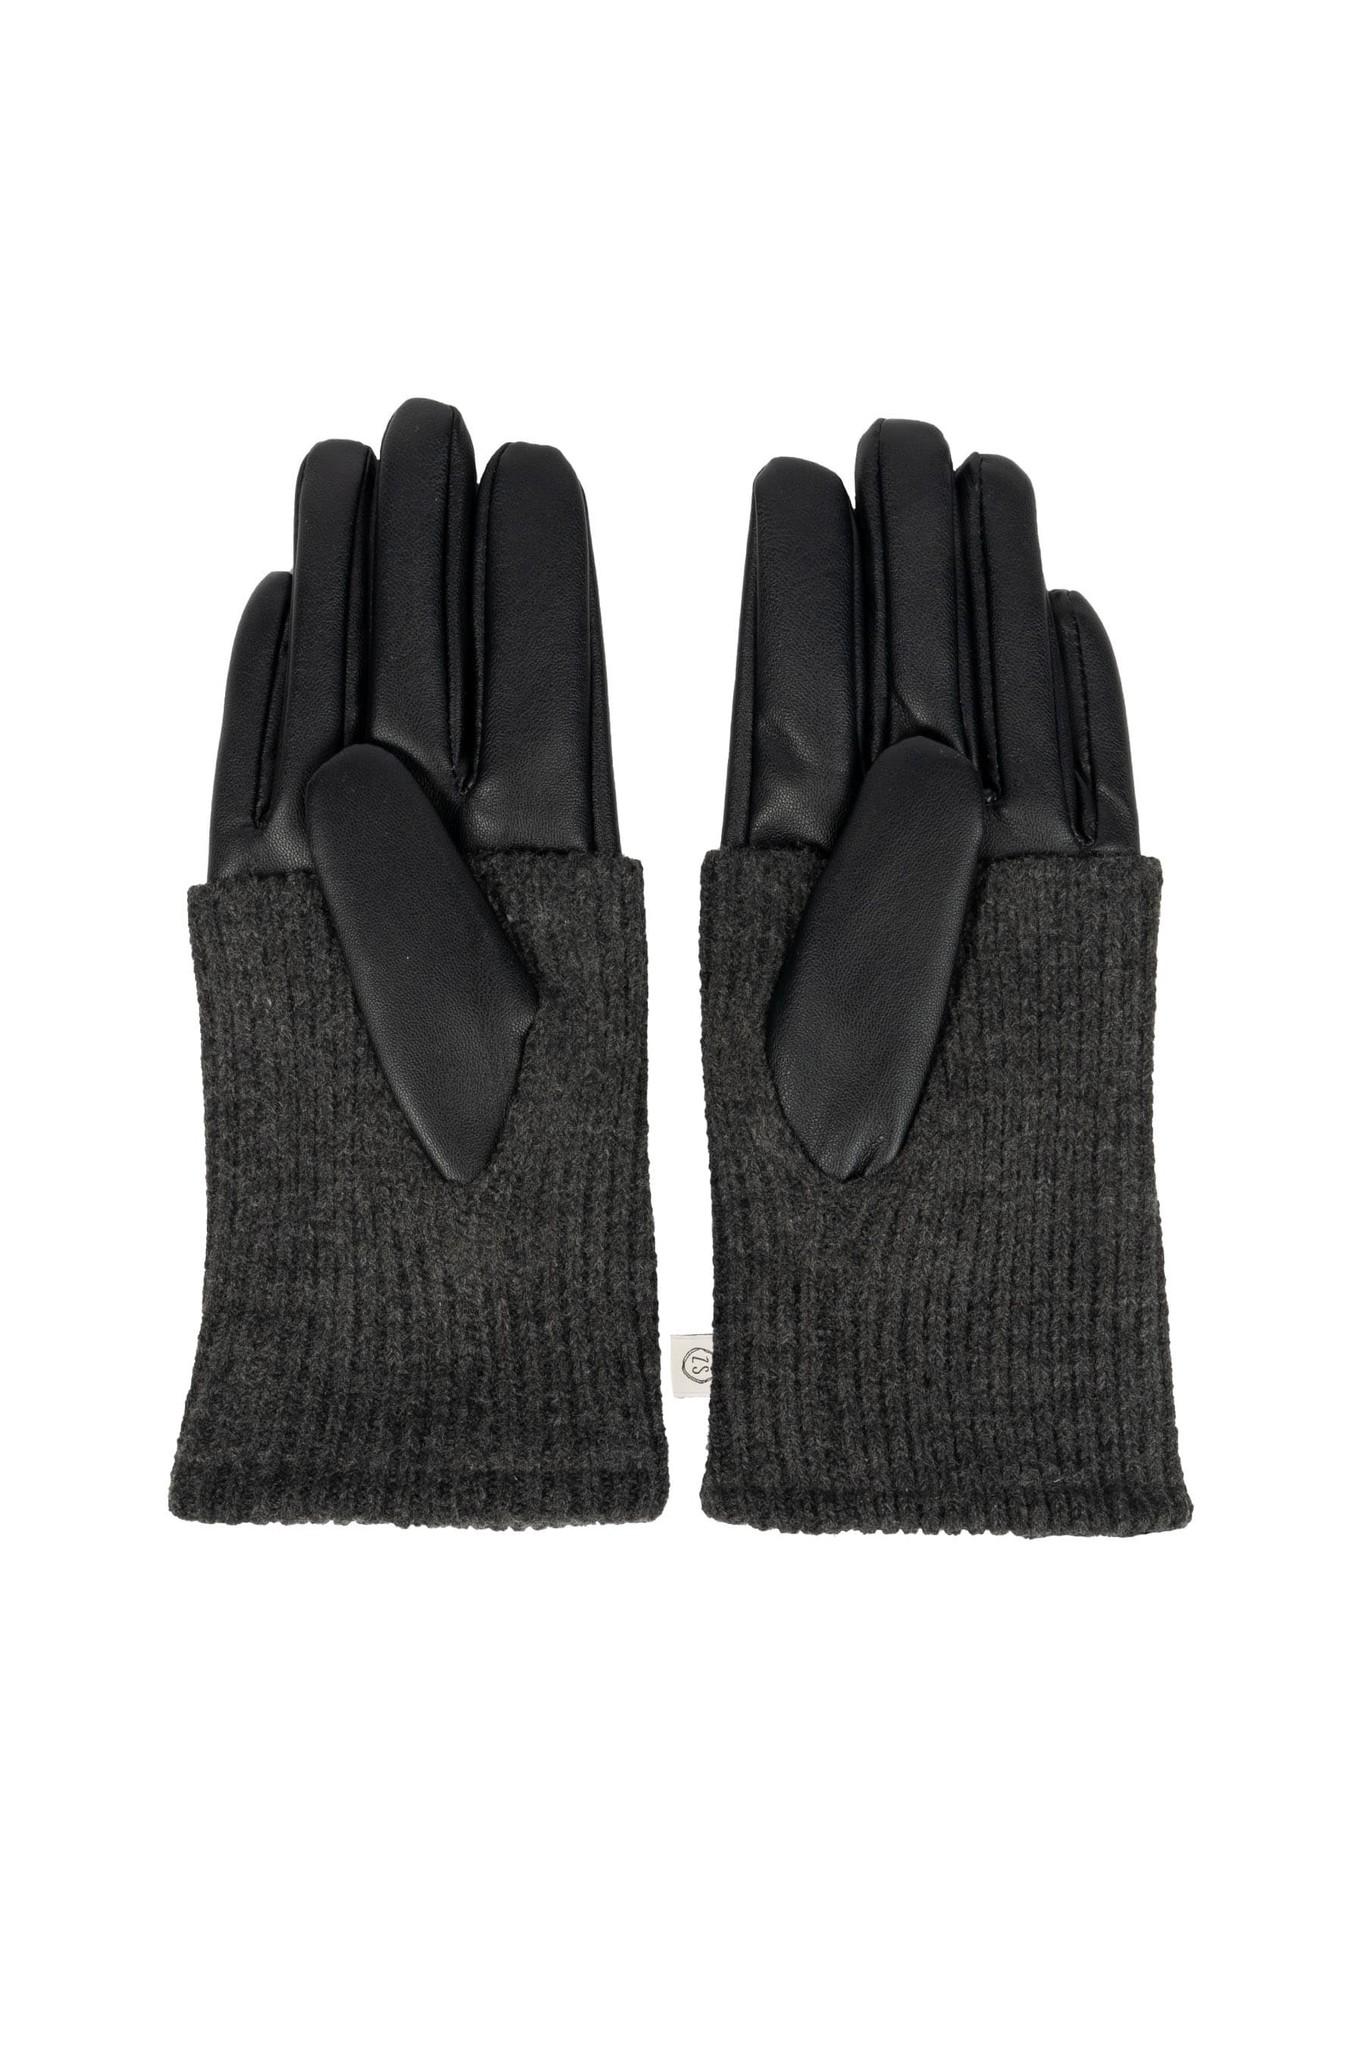 Zusss stoere handschoenen - zwart/grafiet